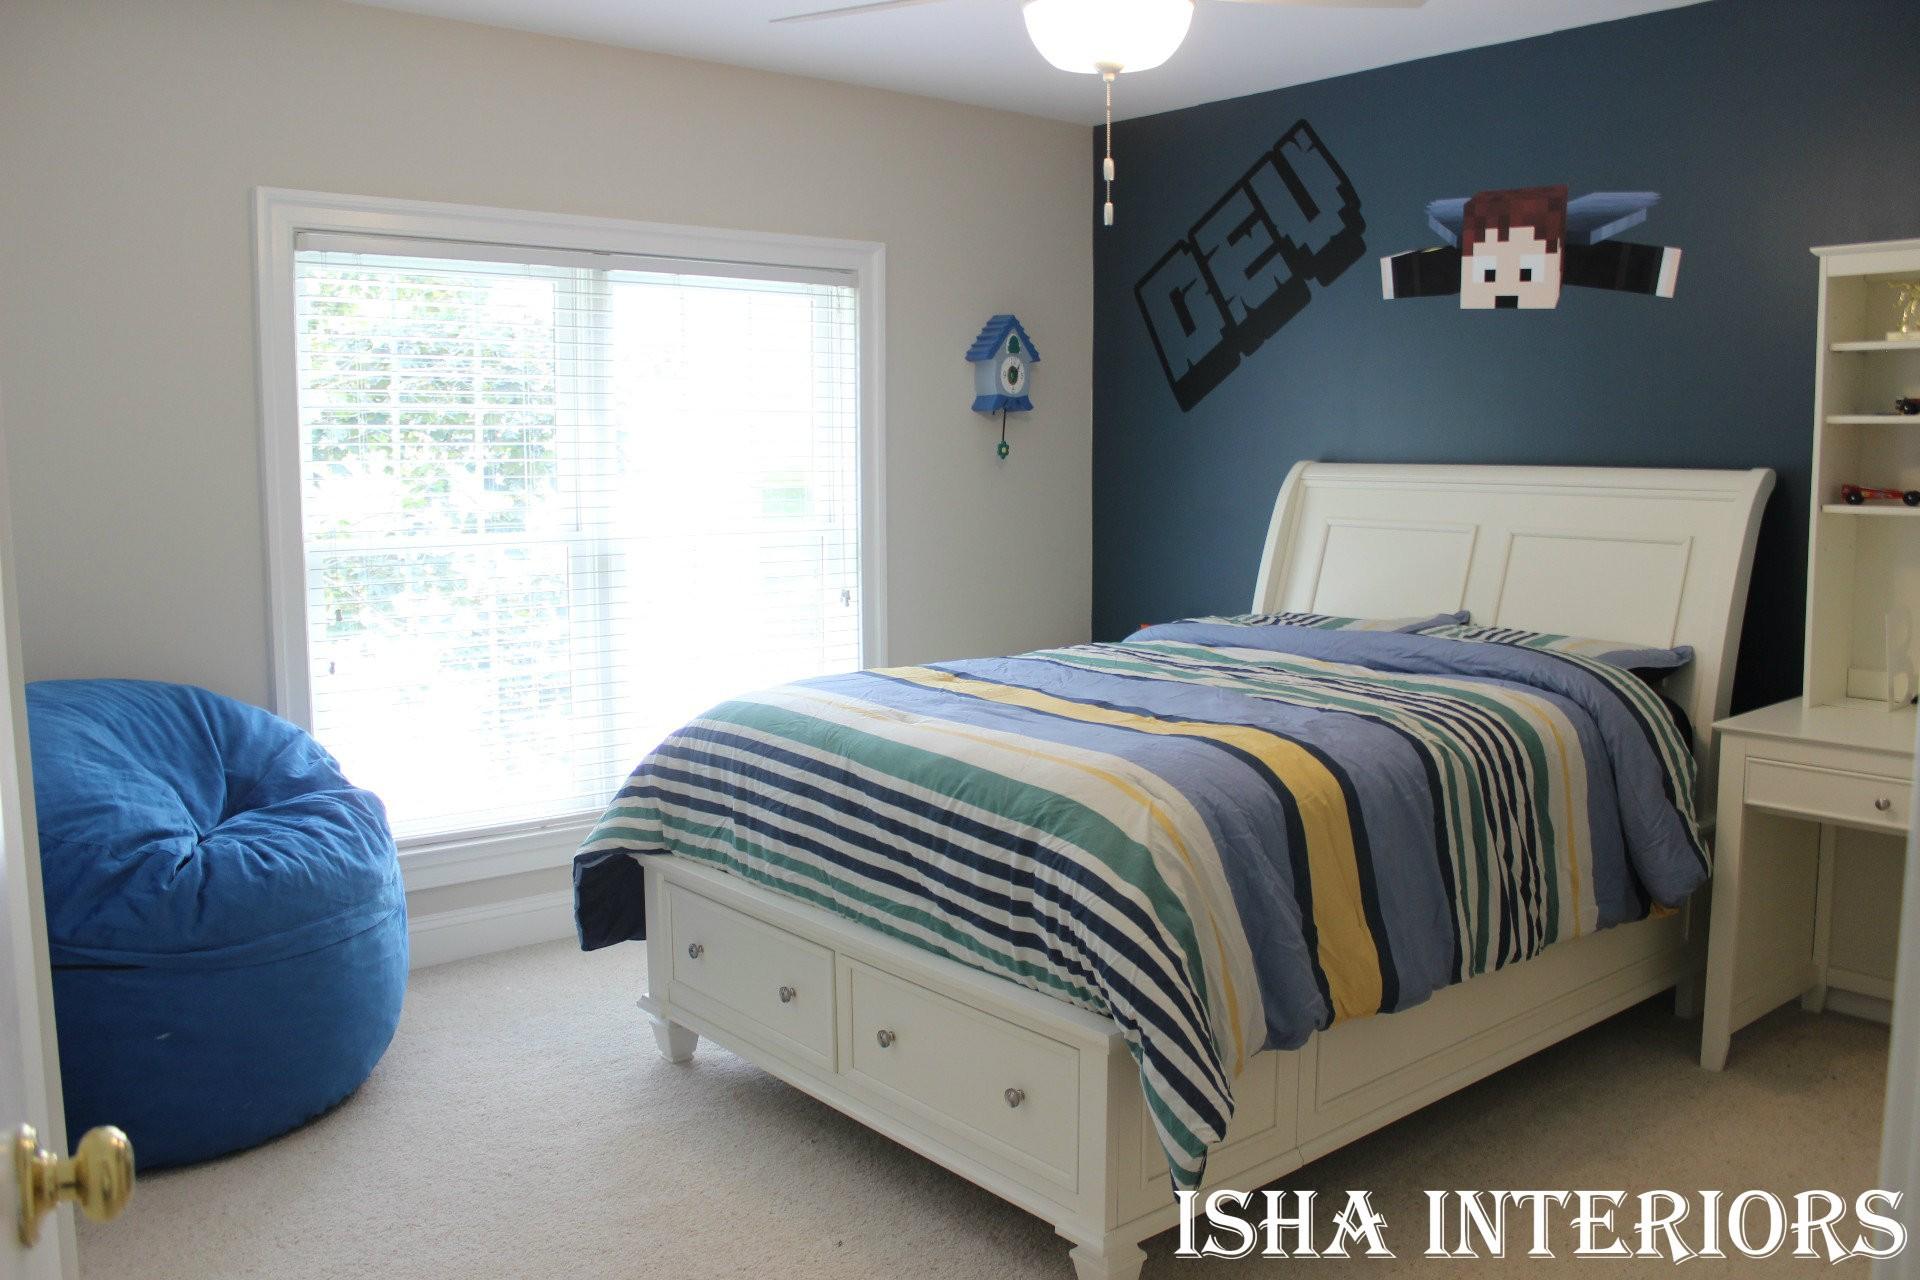 www.kizoa.com_img_0779.jpgrachna.jpg